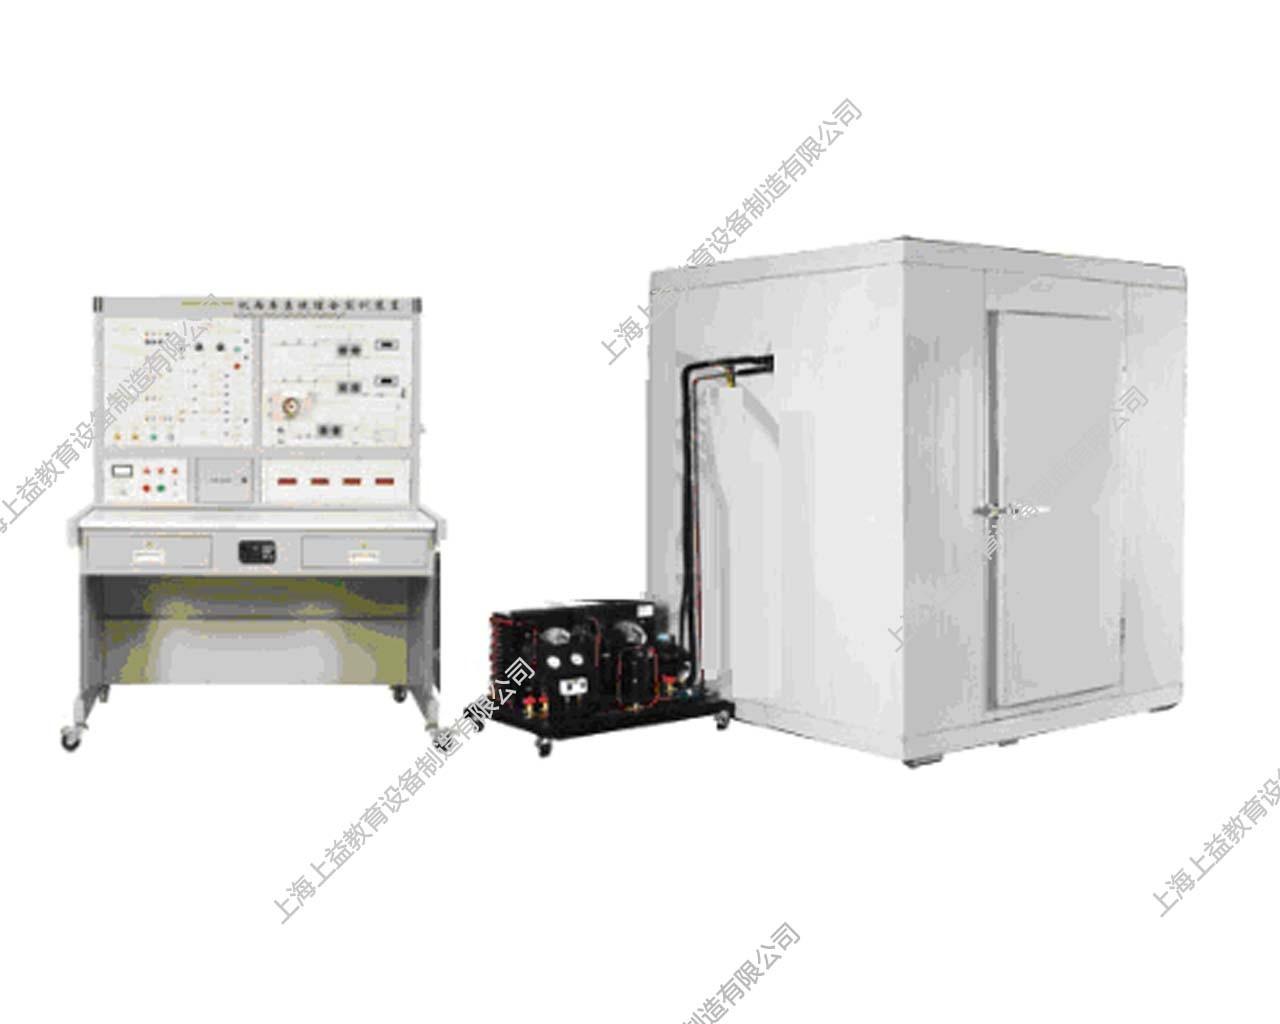 SYZLRX-53J 一机两库系统综合wwwlehu8vip装置